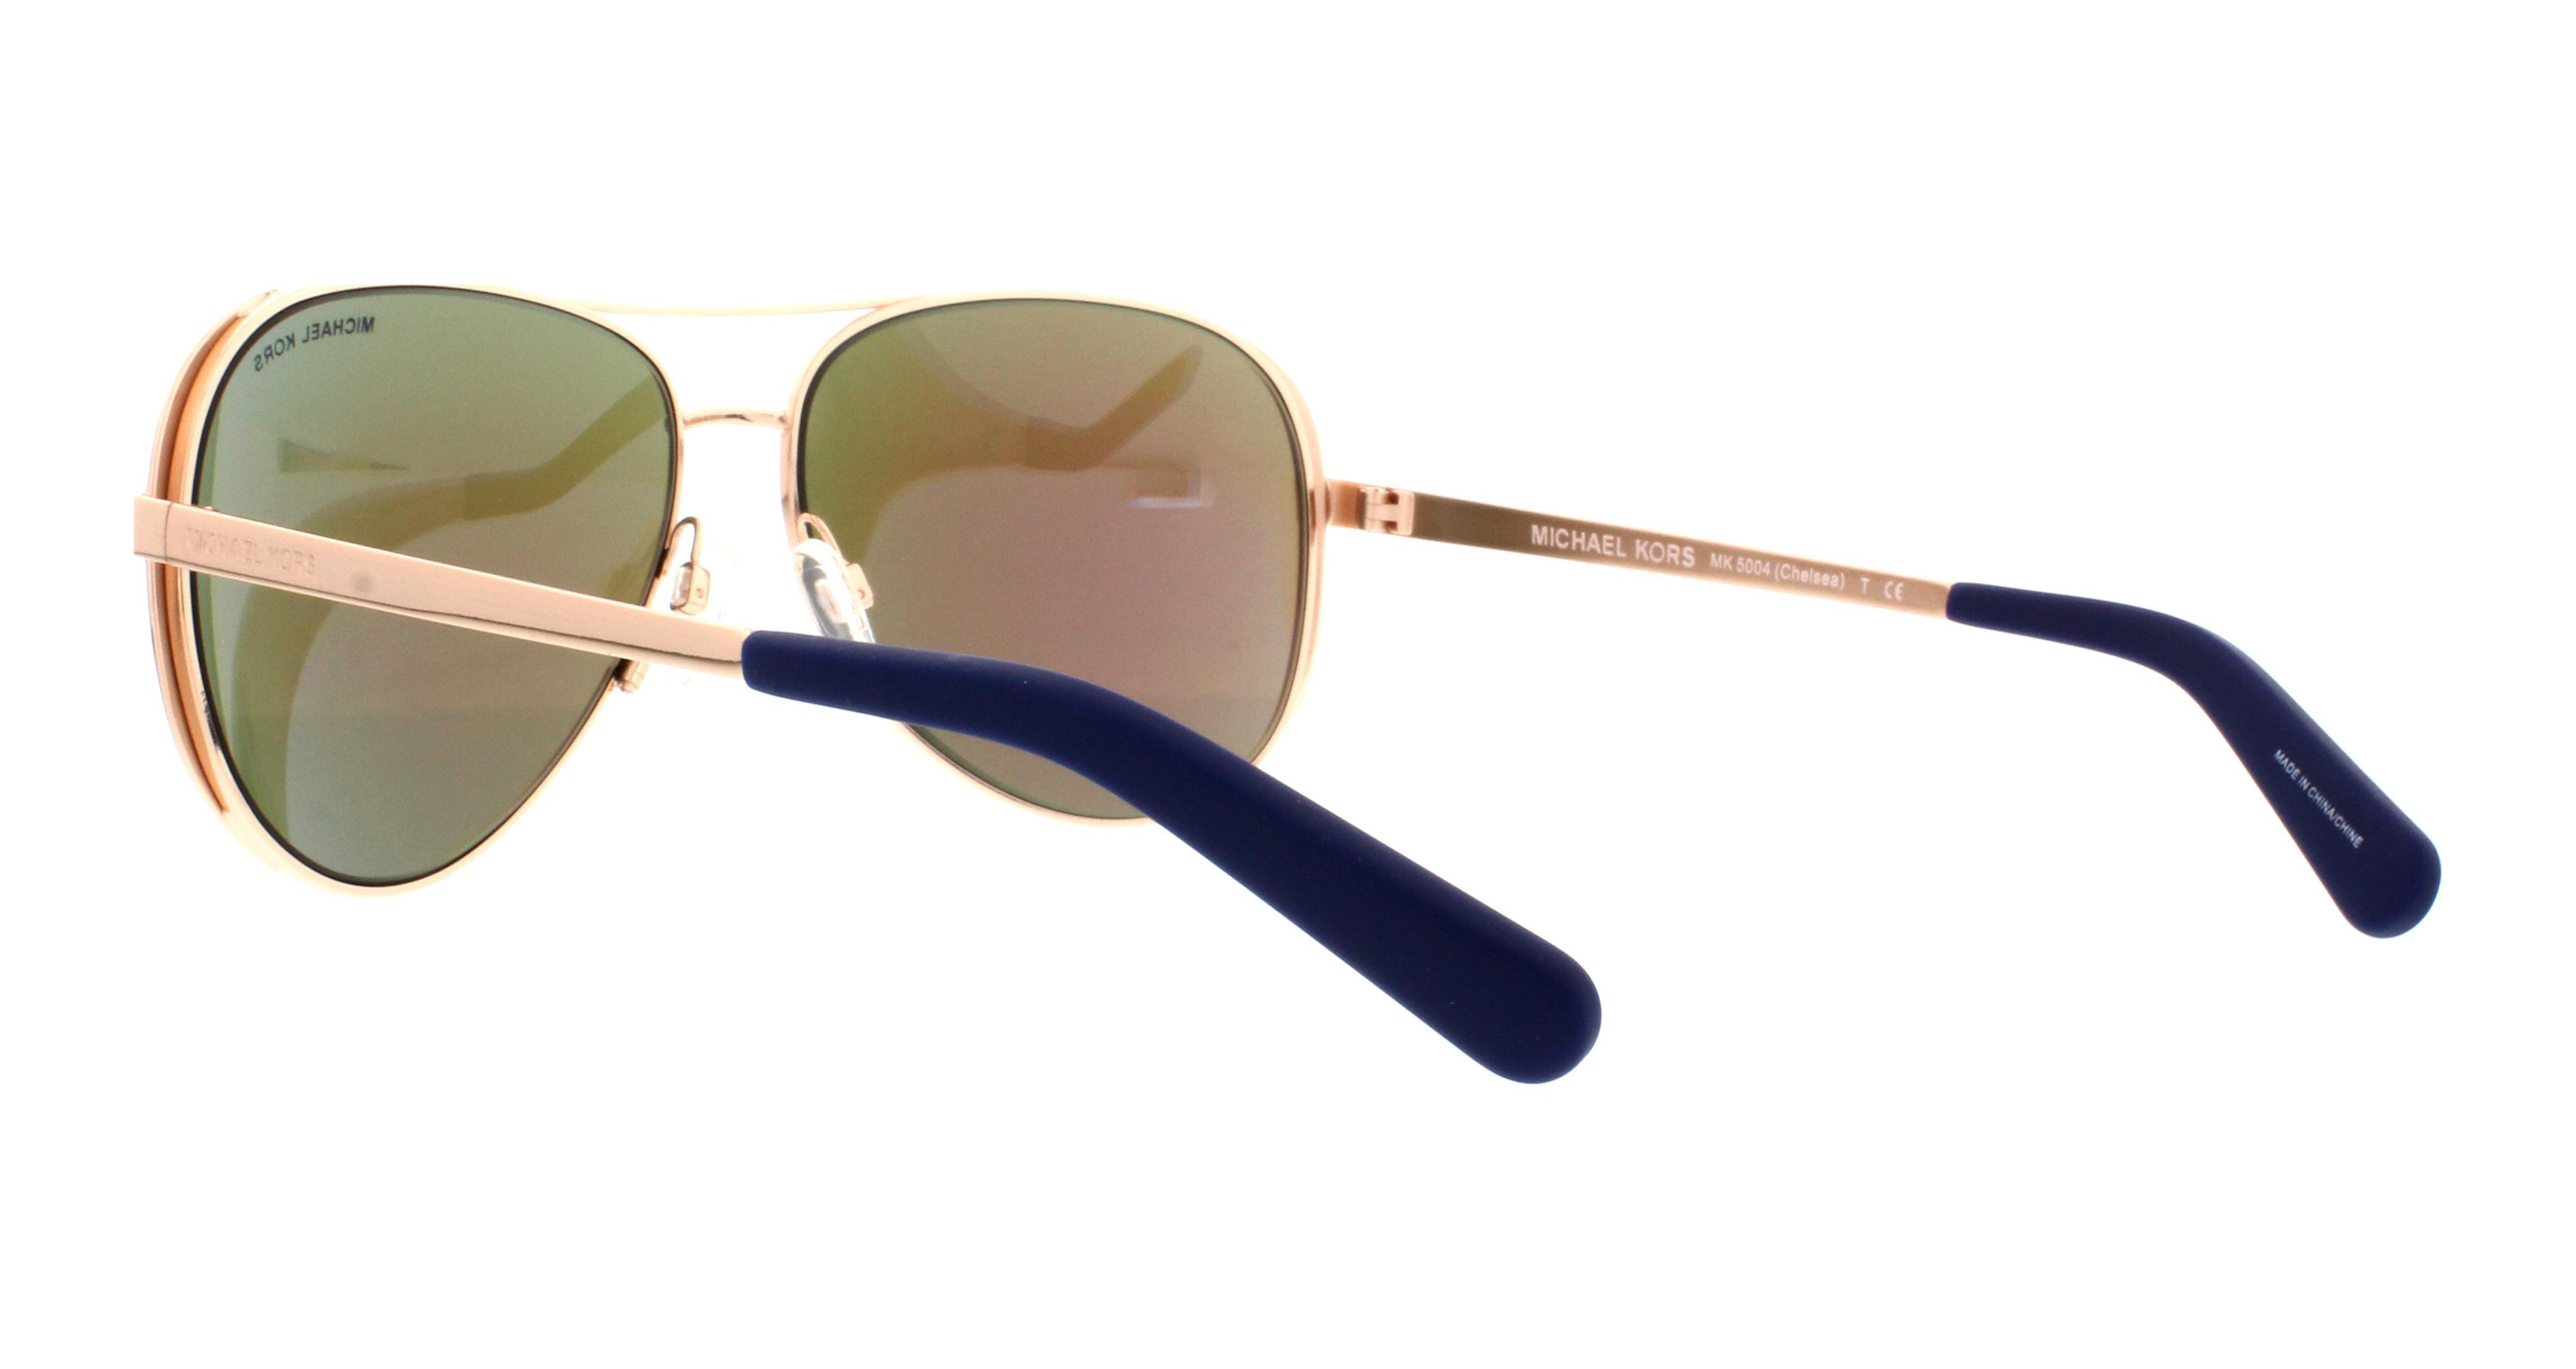 d727d434b4a7 Designer Frames Outlet. Michael Kors MK5004 Chelsea